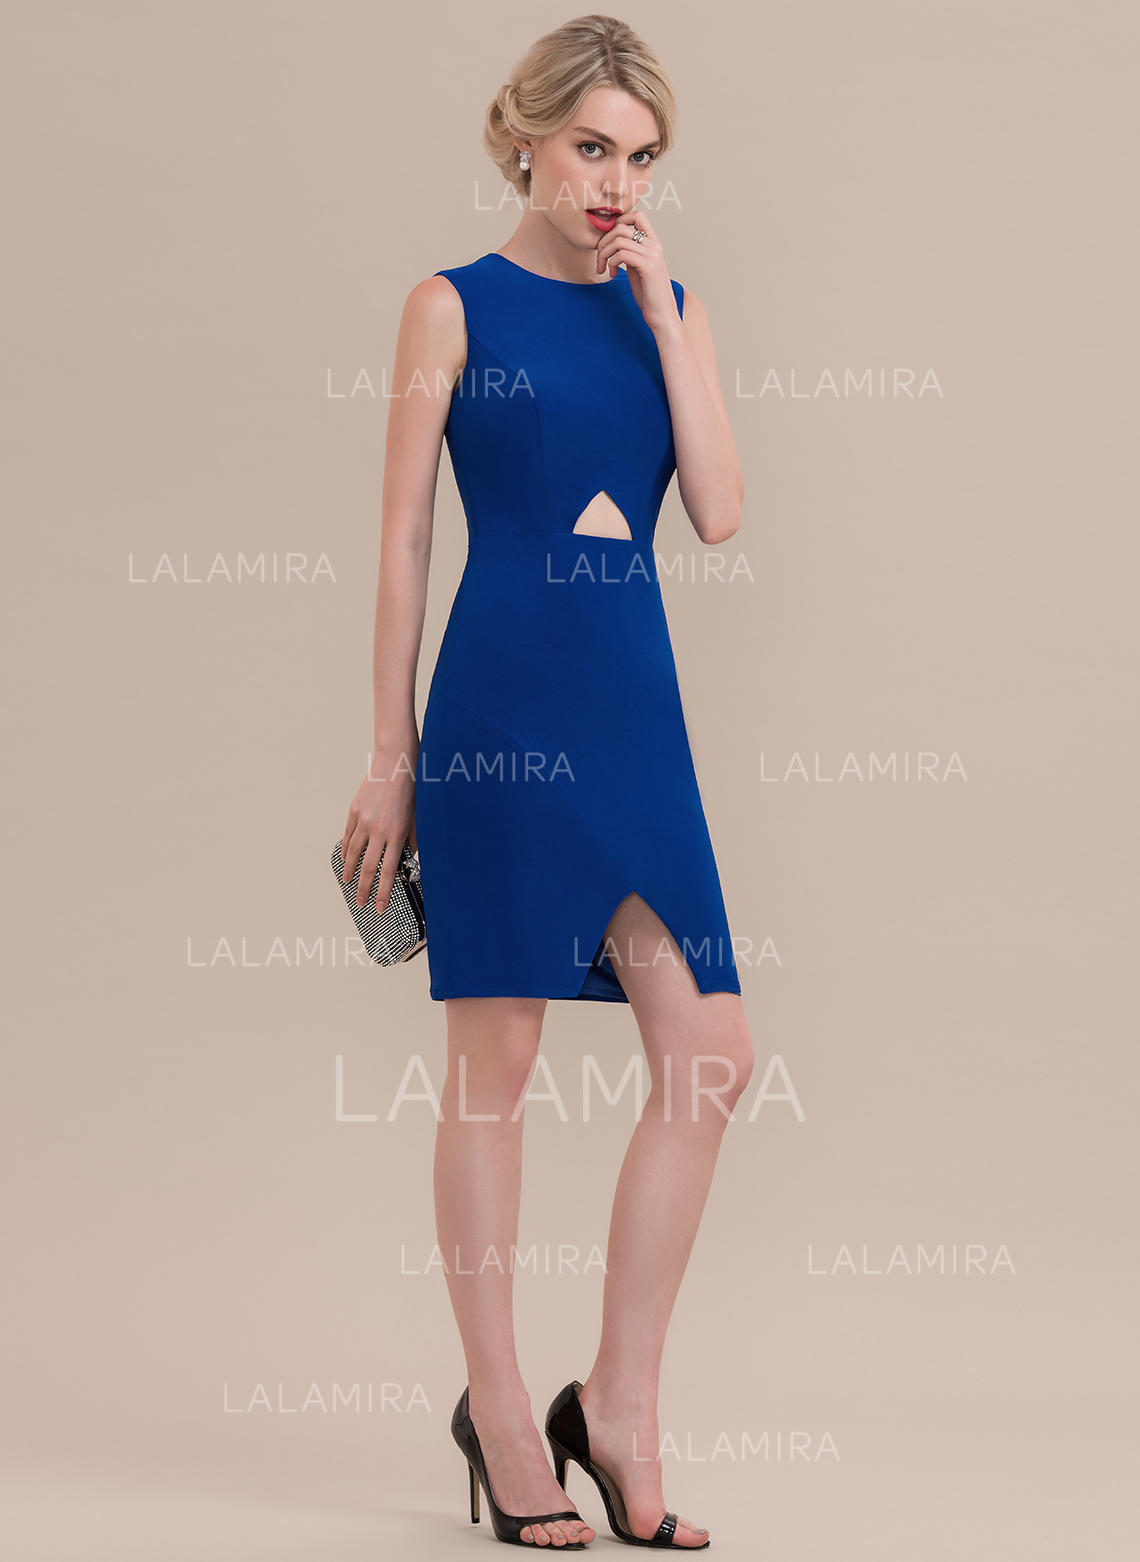 b5792c6ca325b Knee-Length Sheath/Column Sleeveless Jersey Cocktail Dresses (016108740). Loading  zoom